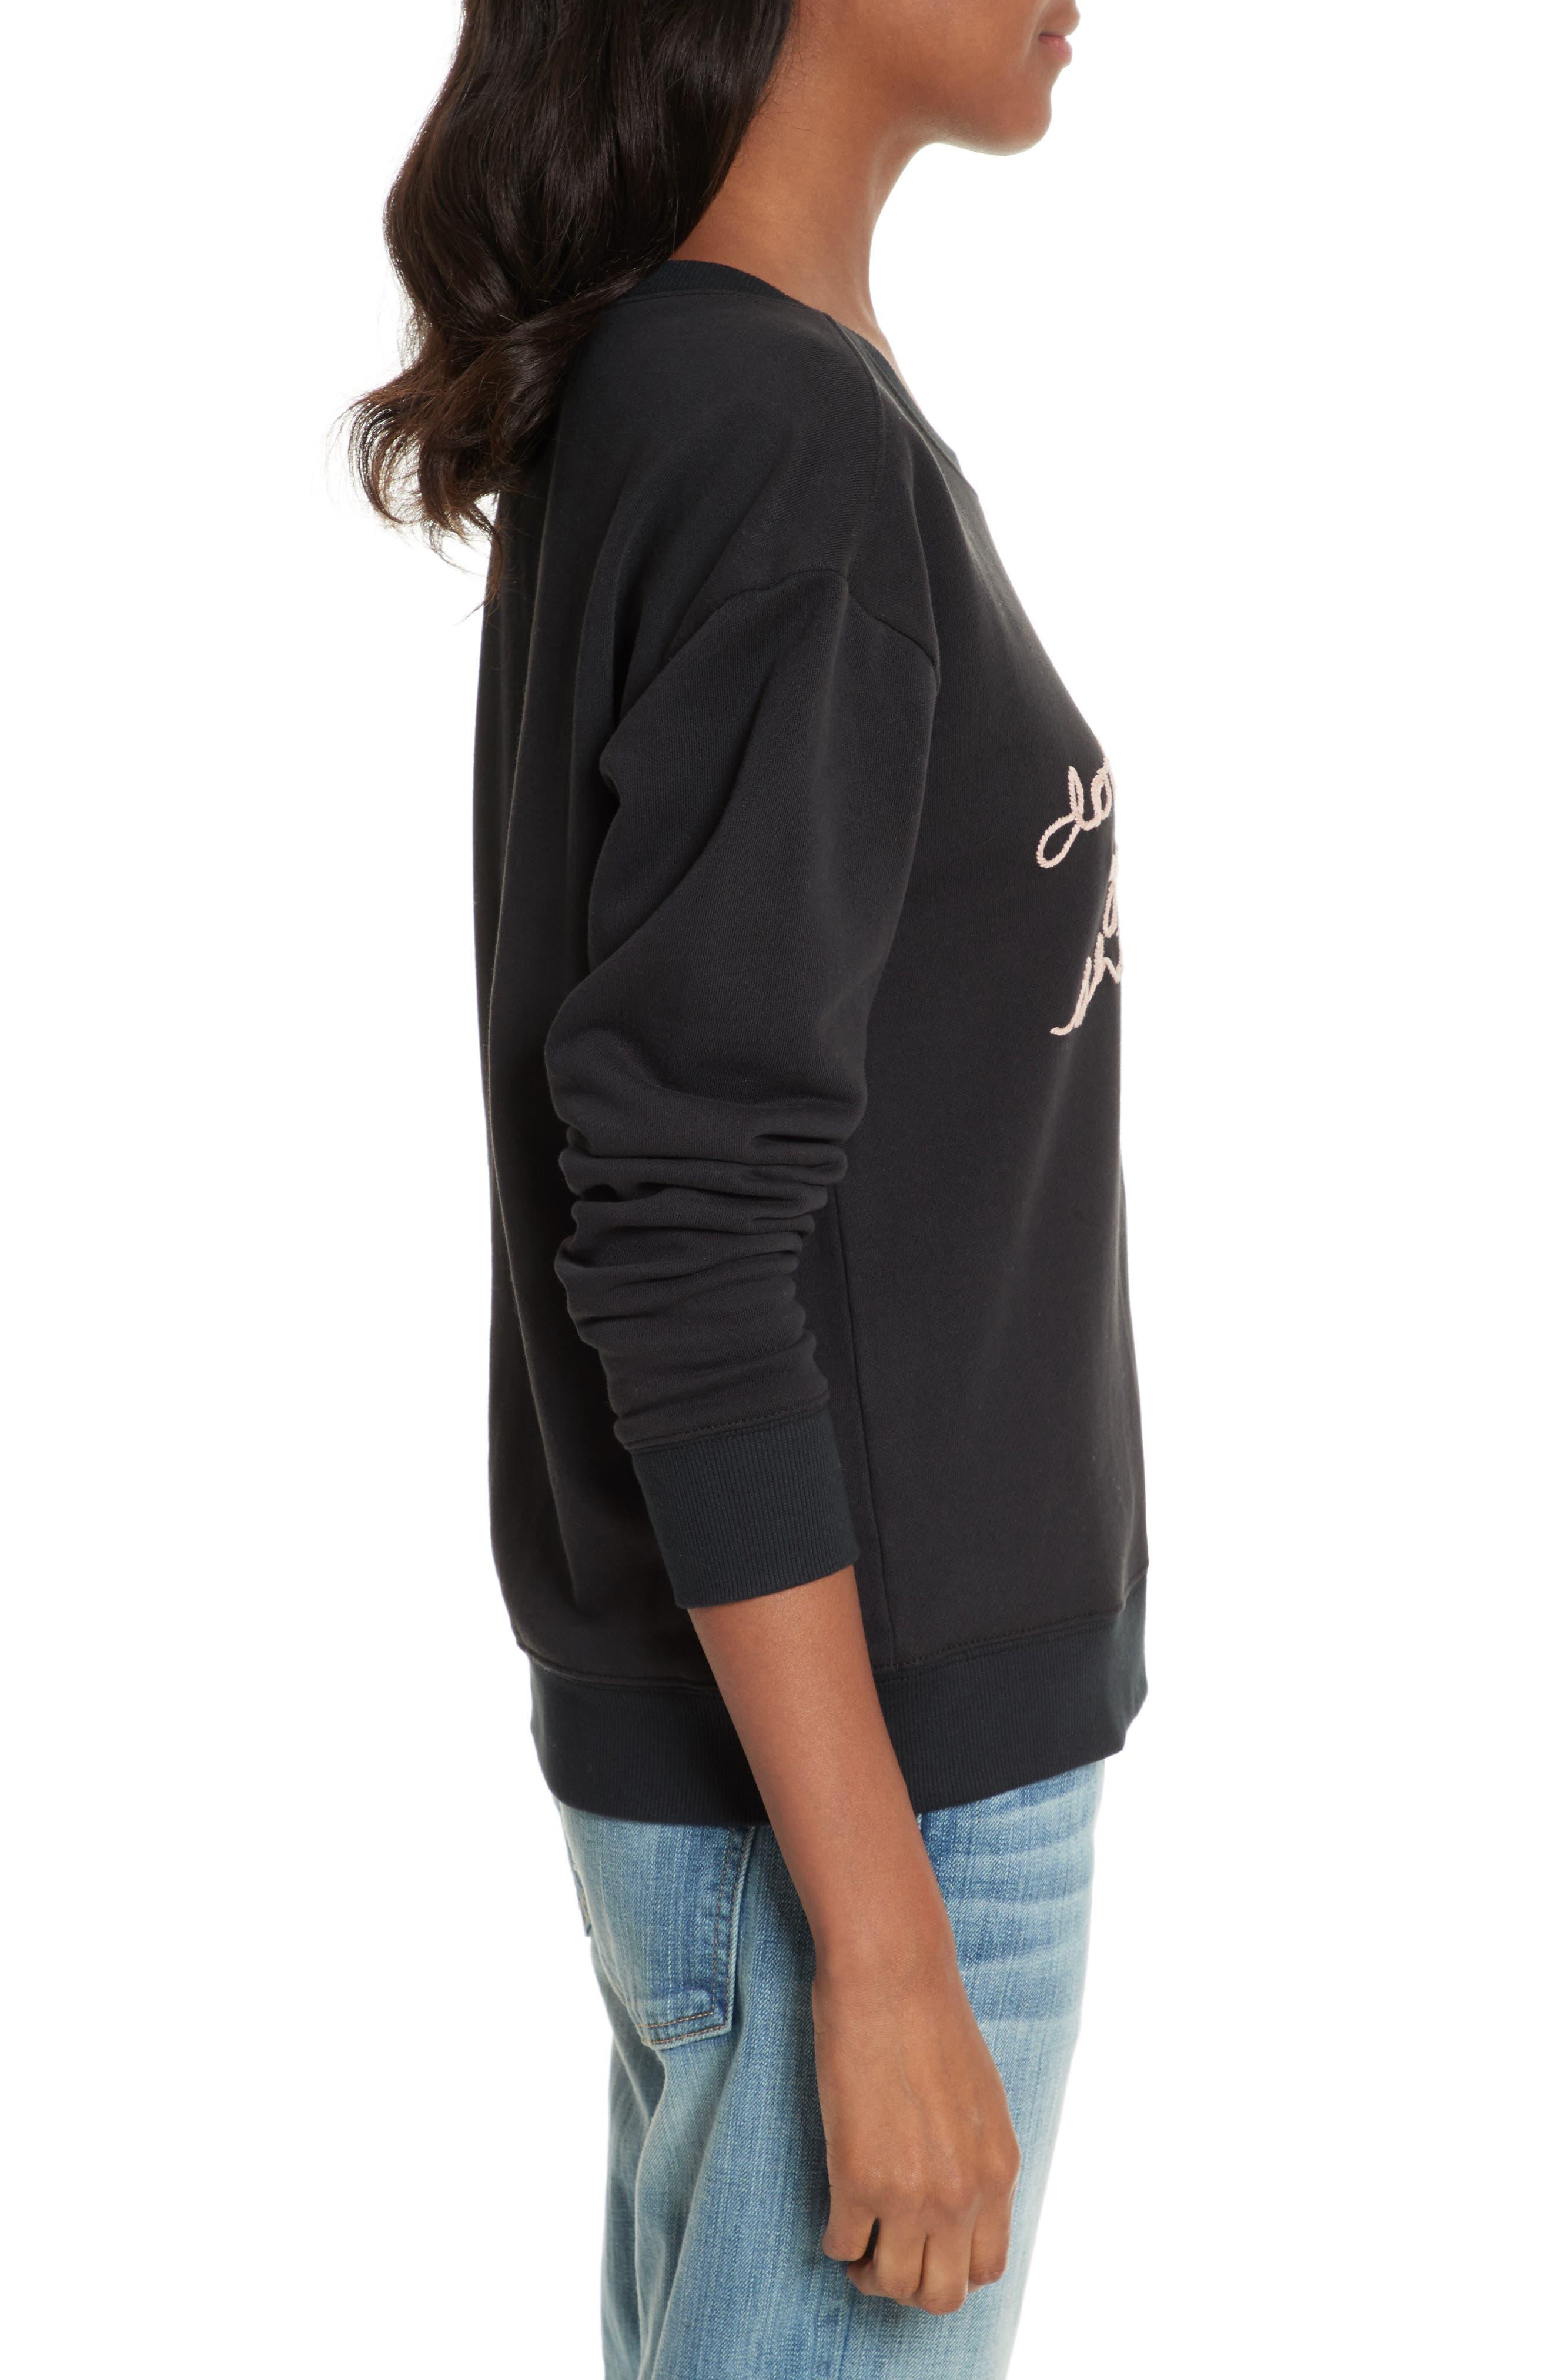 Rikke B Embroidered Sweatshirt,                             Alternate thumbnail 3, color,                             Caviar